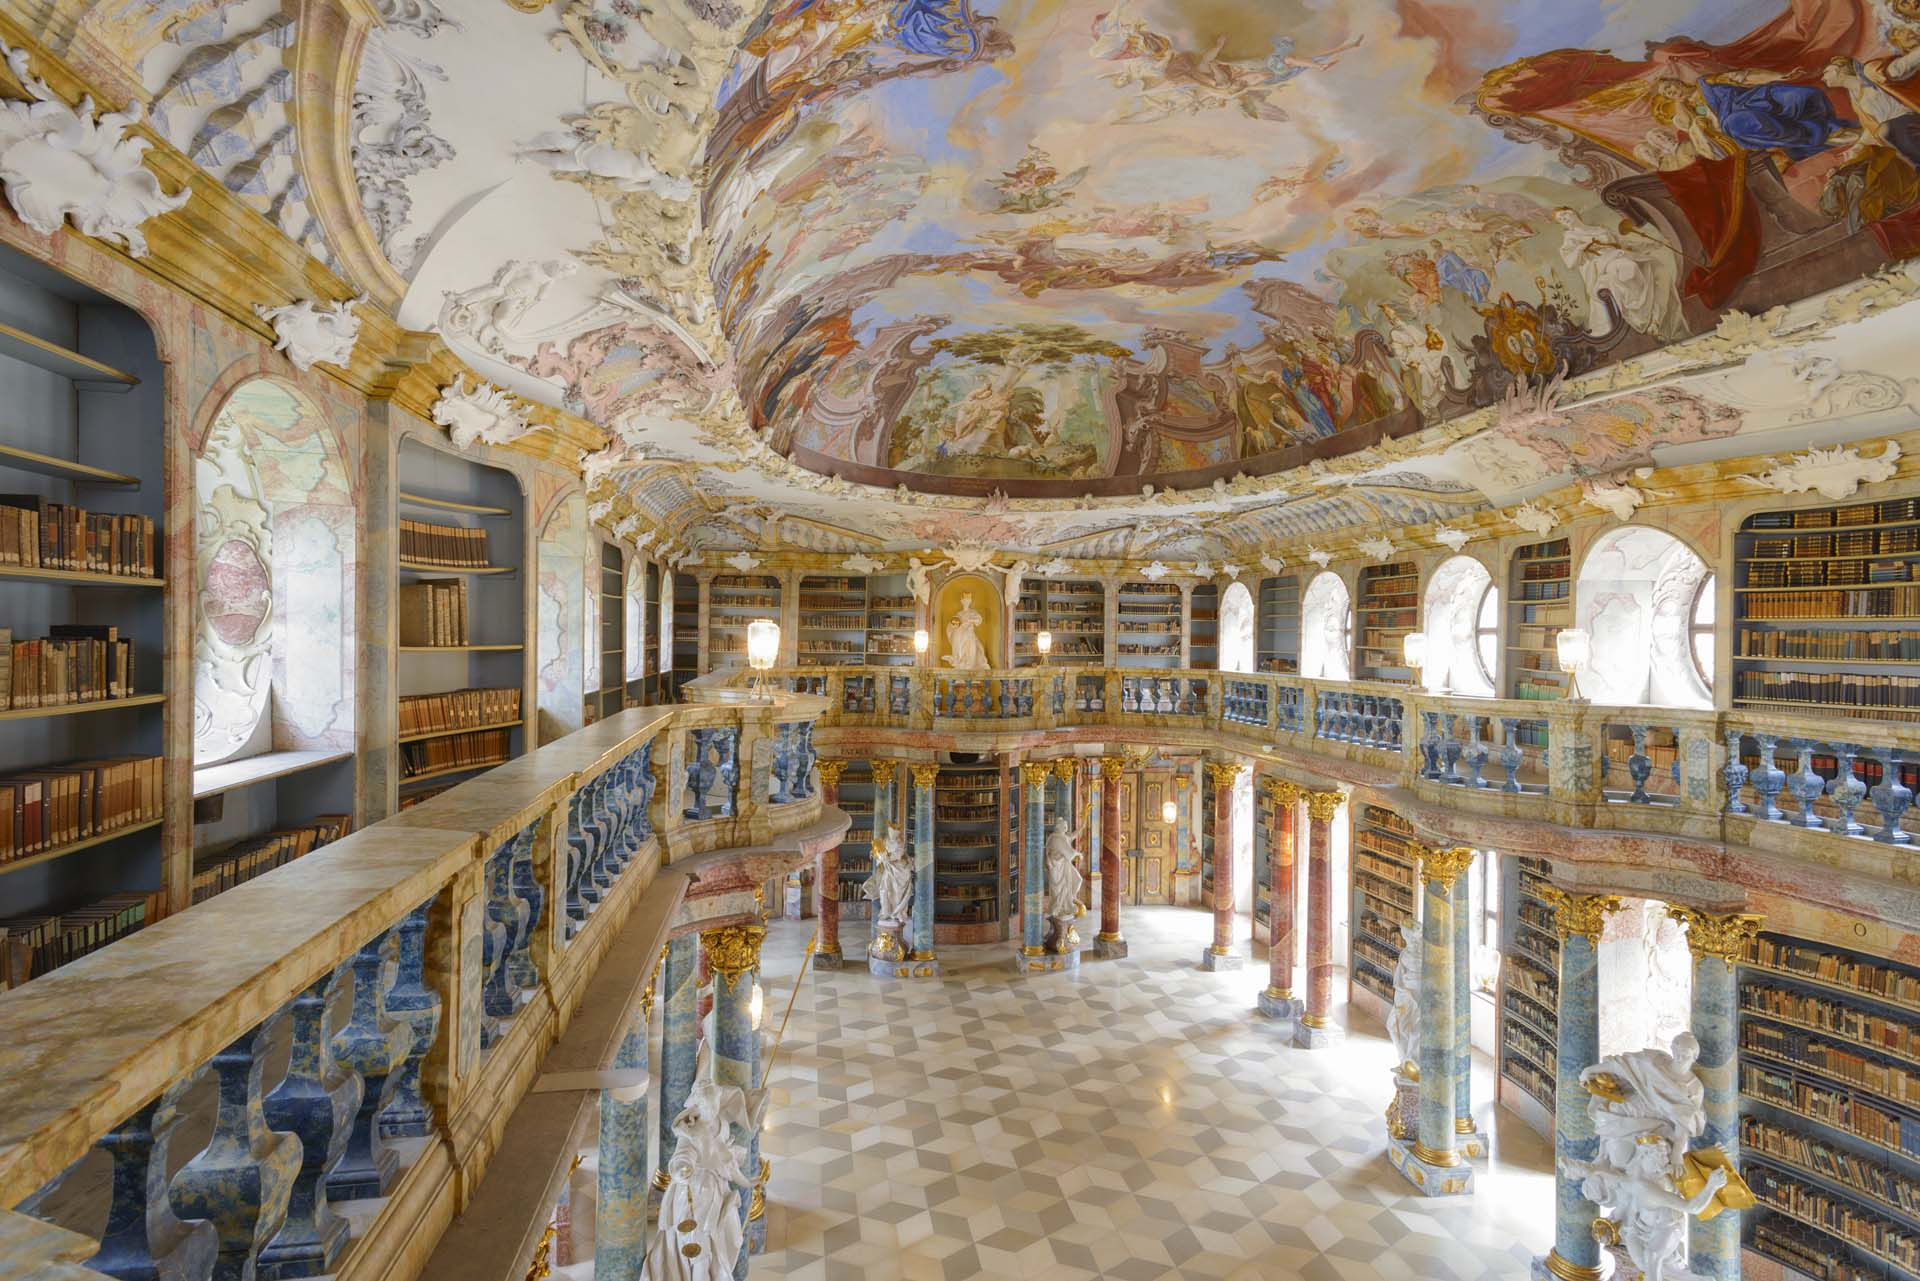 Bibliothekssaal im Kloster Wiblingen